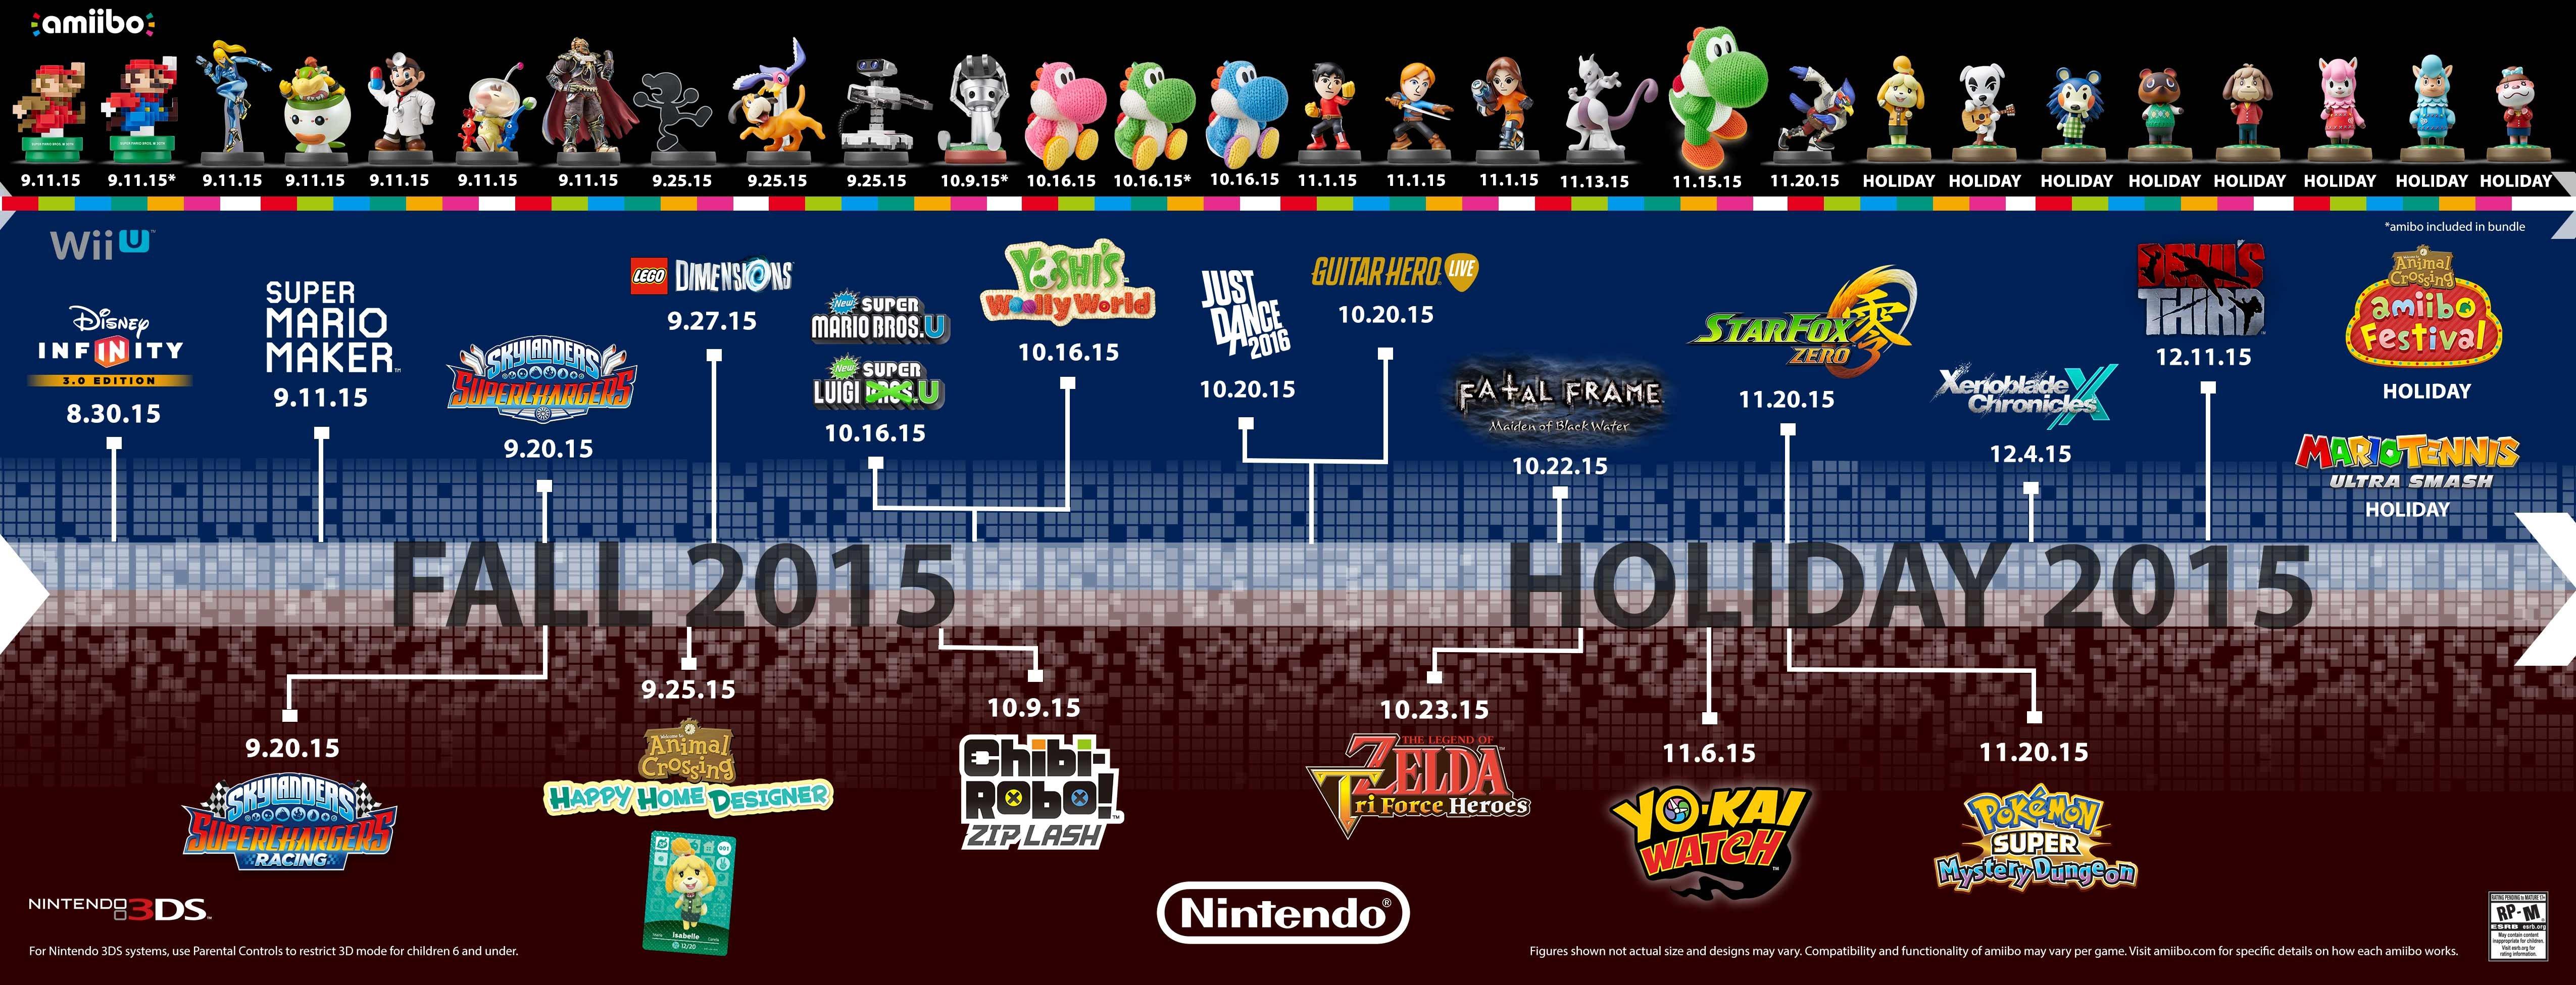 Wii U 2015 America - Nintenbit